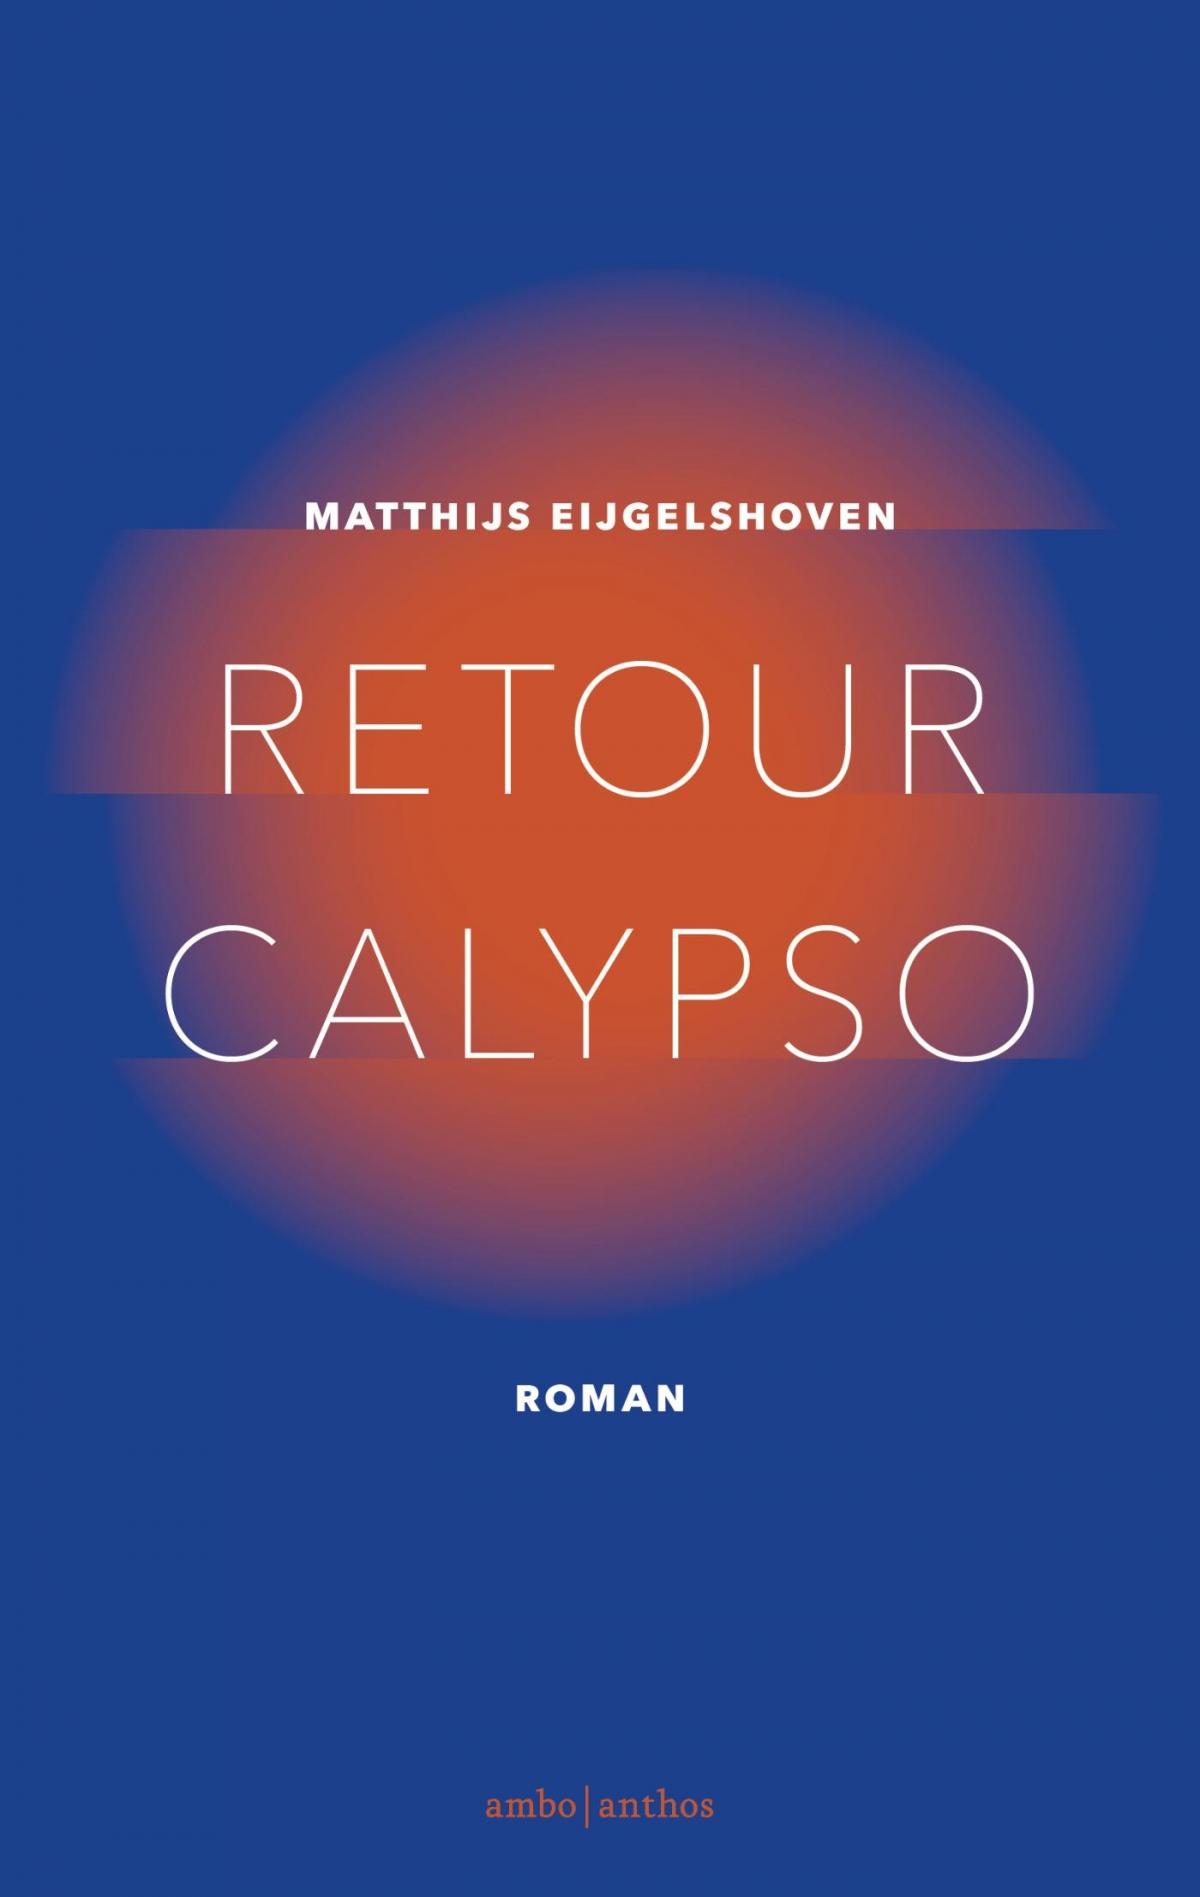 Retour calypso - boekrecensie